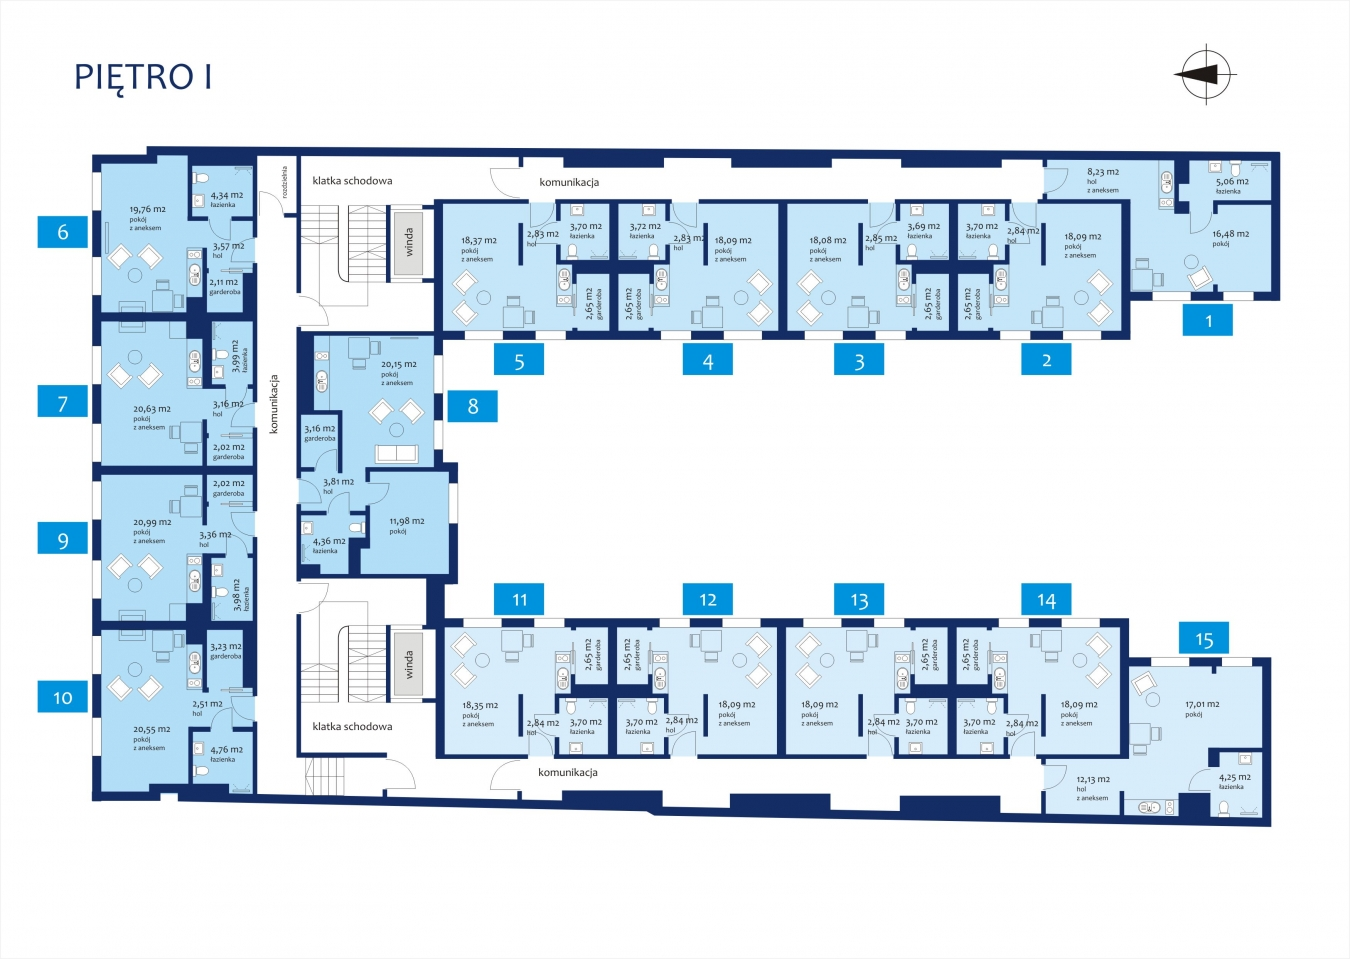 N23 - Piętro 1